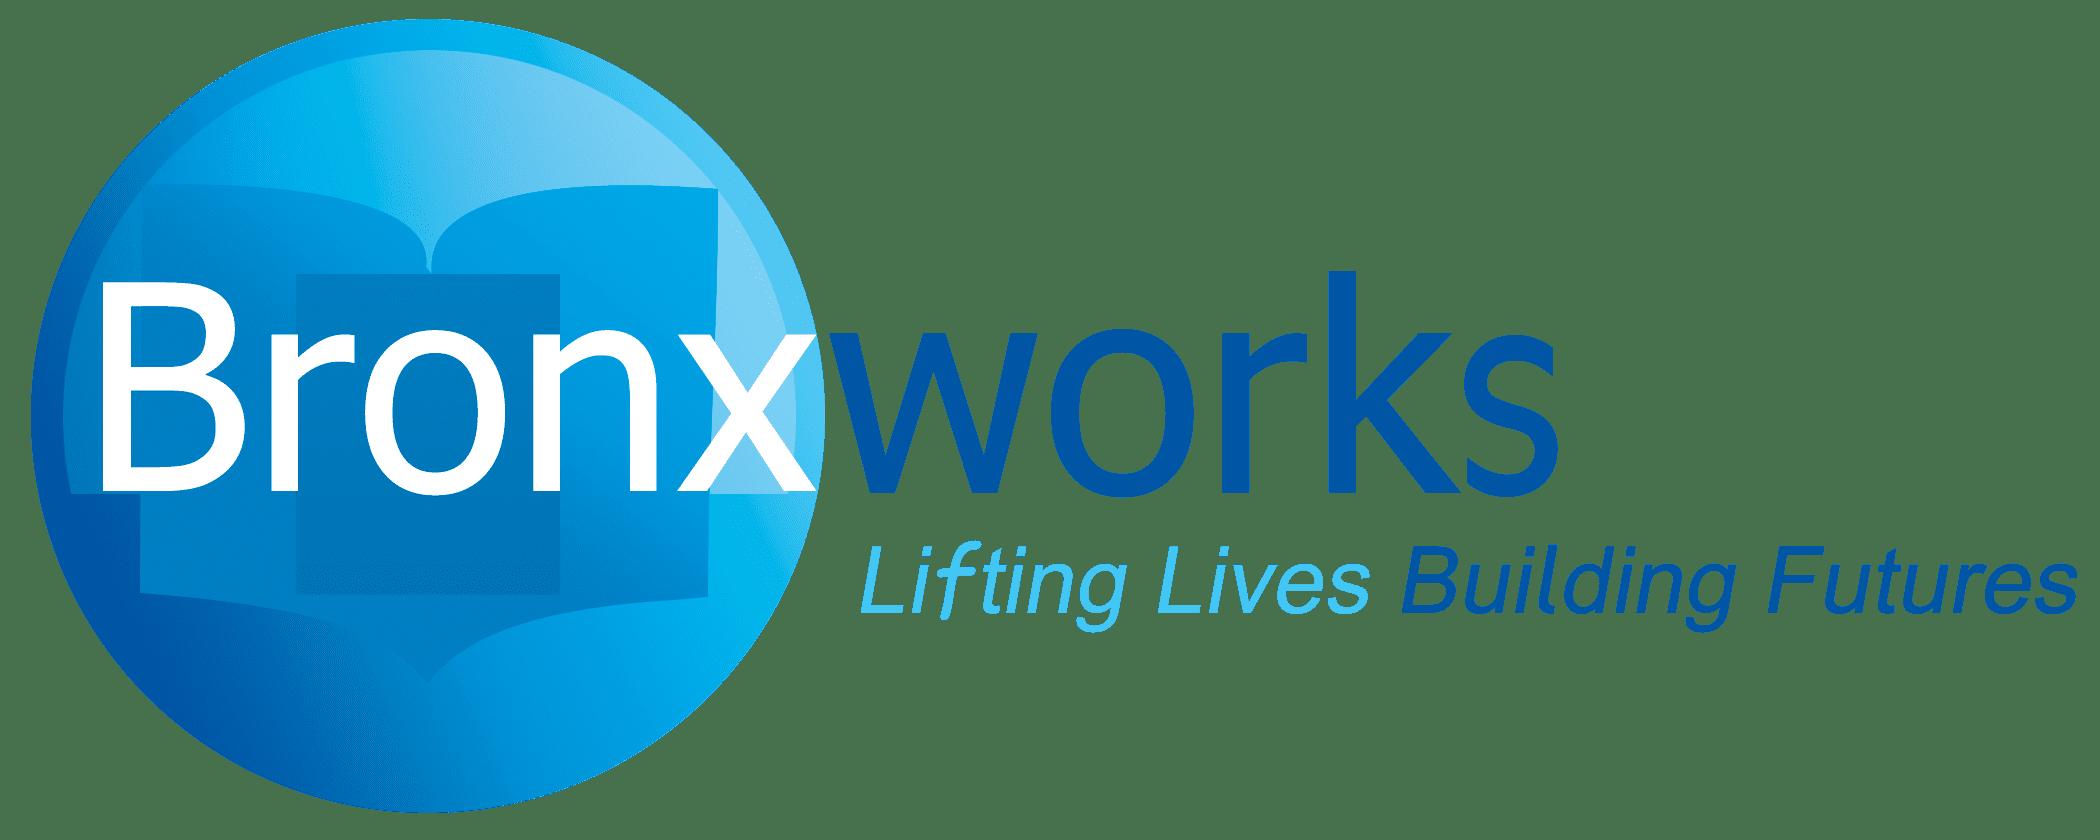 BronxWorks logo